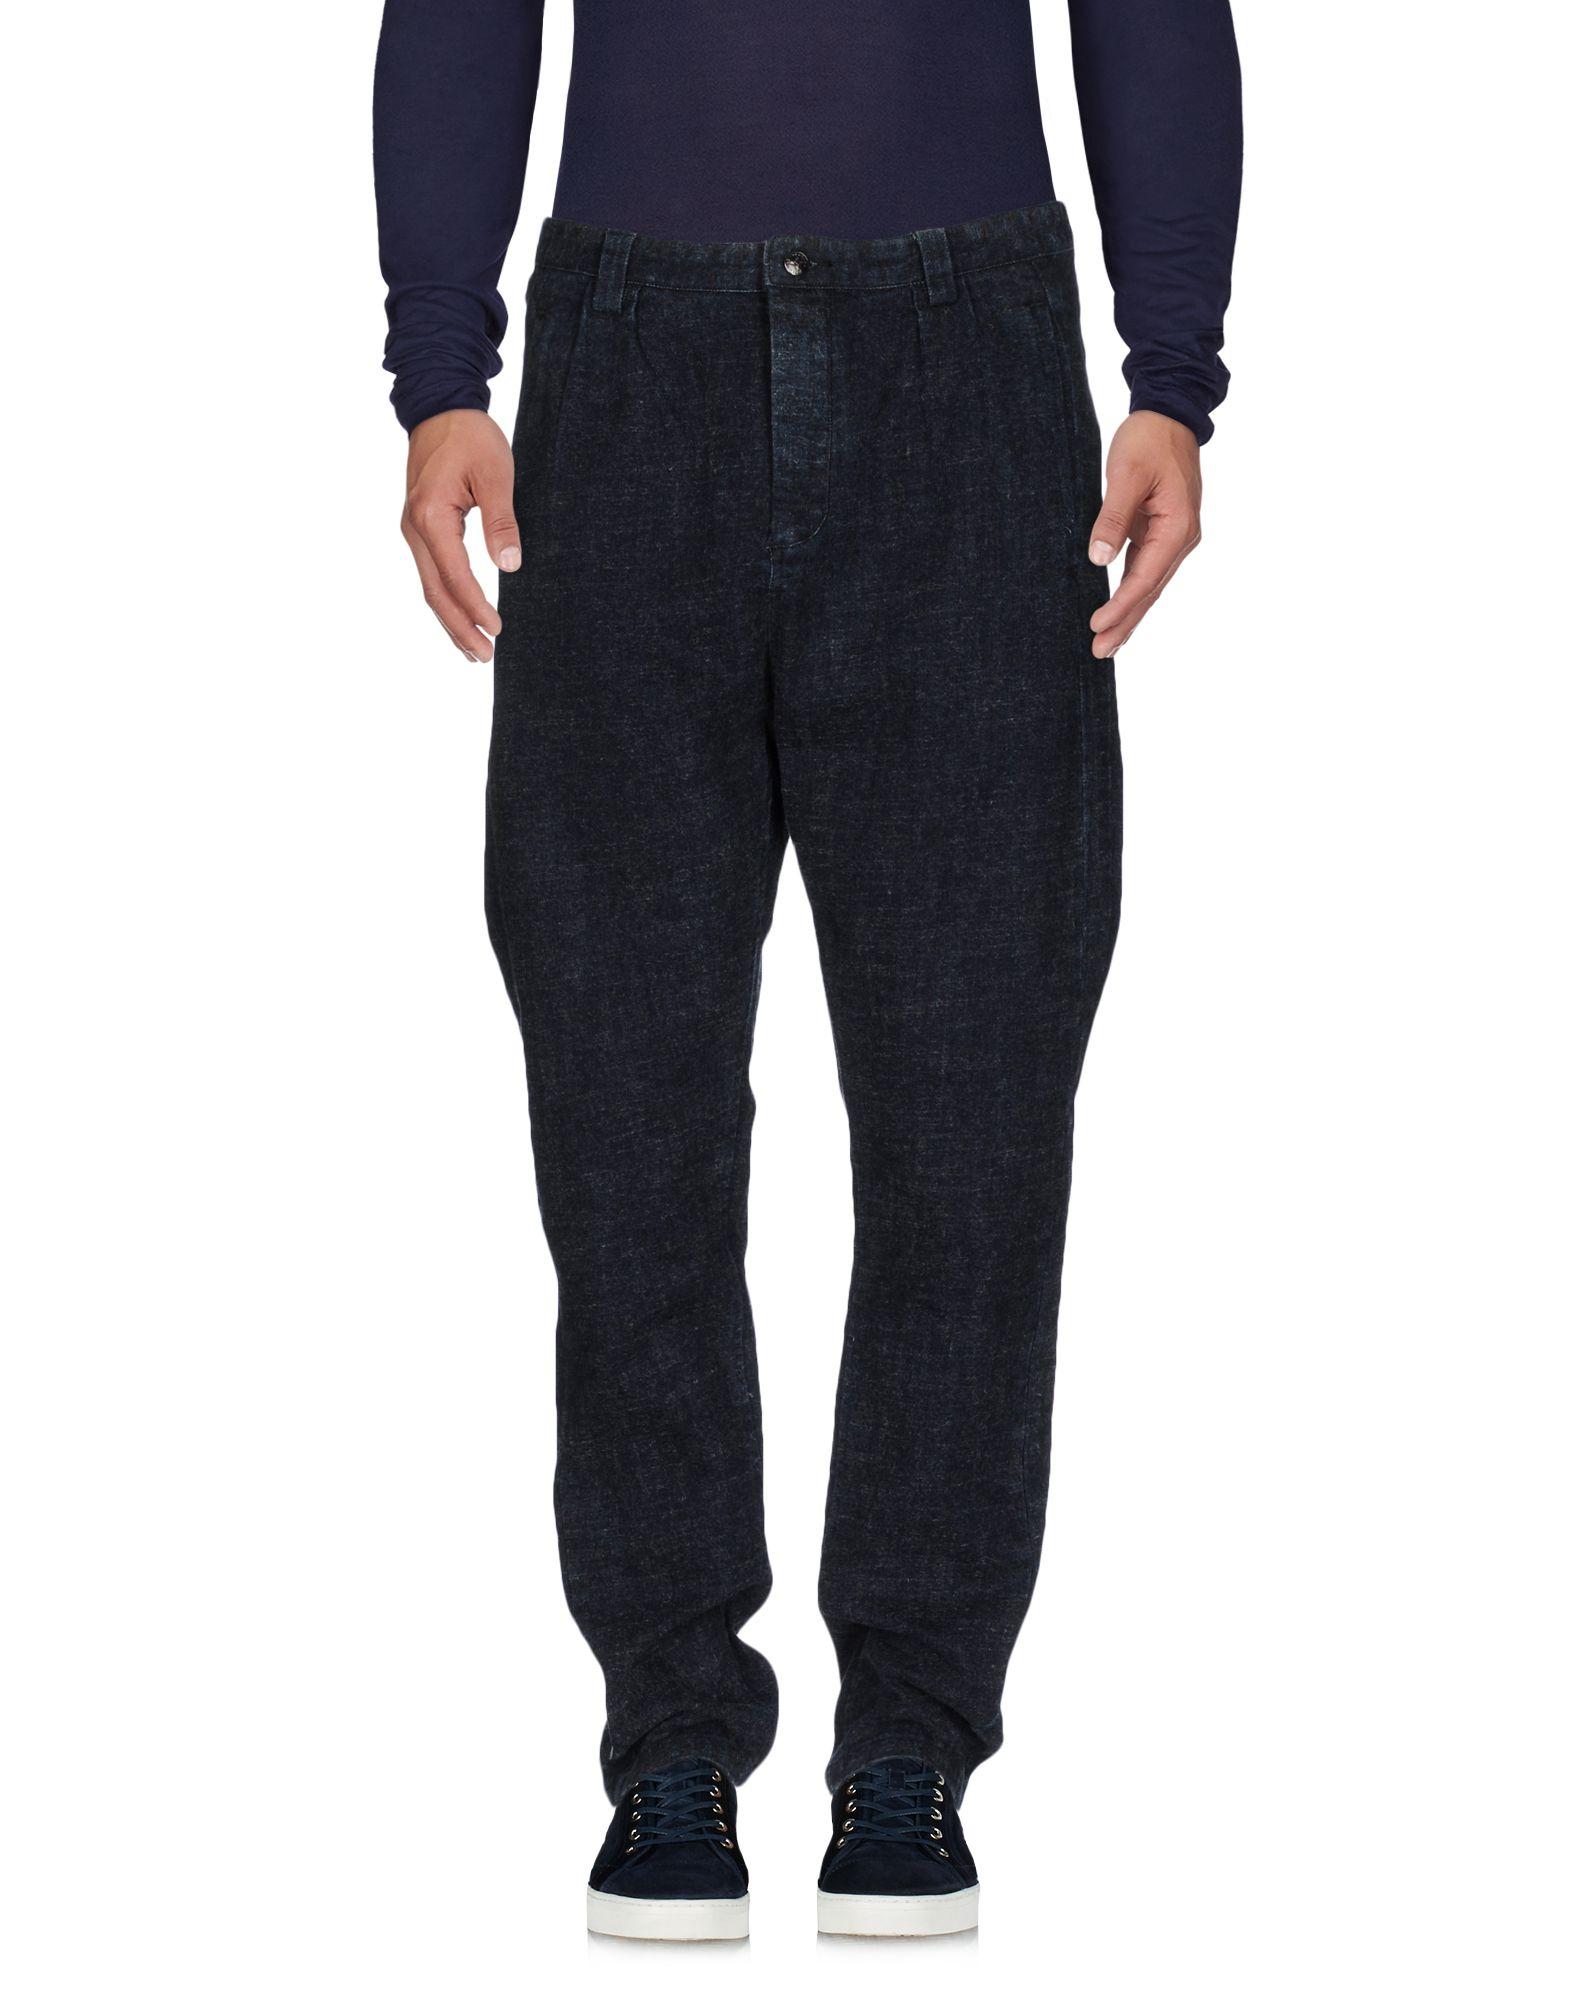 JOURNAL Denim Pants in Dark Blue